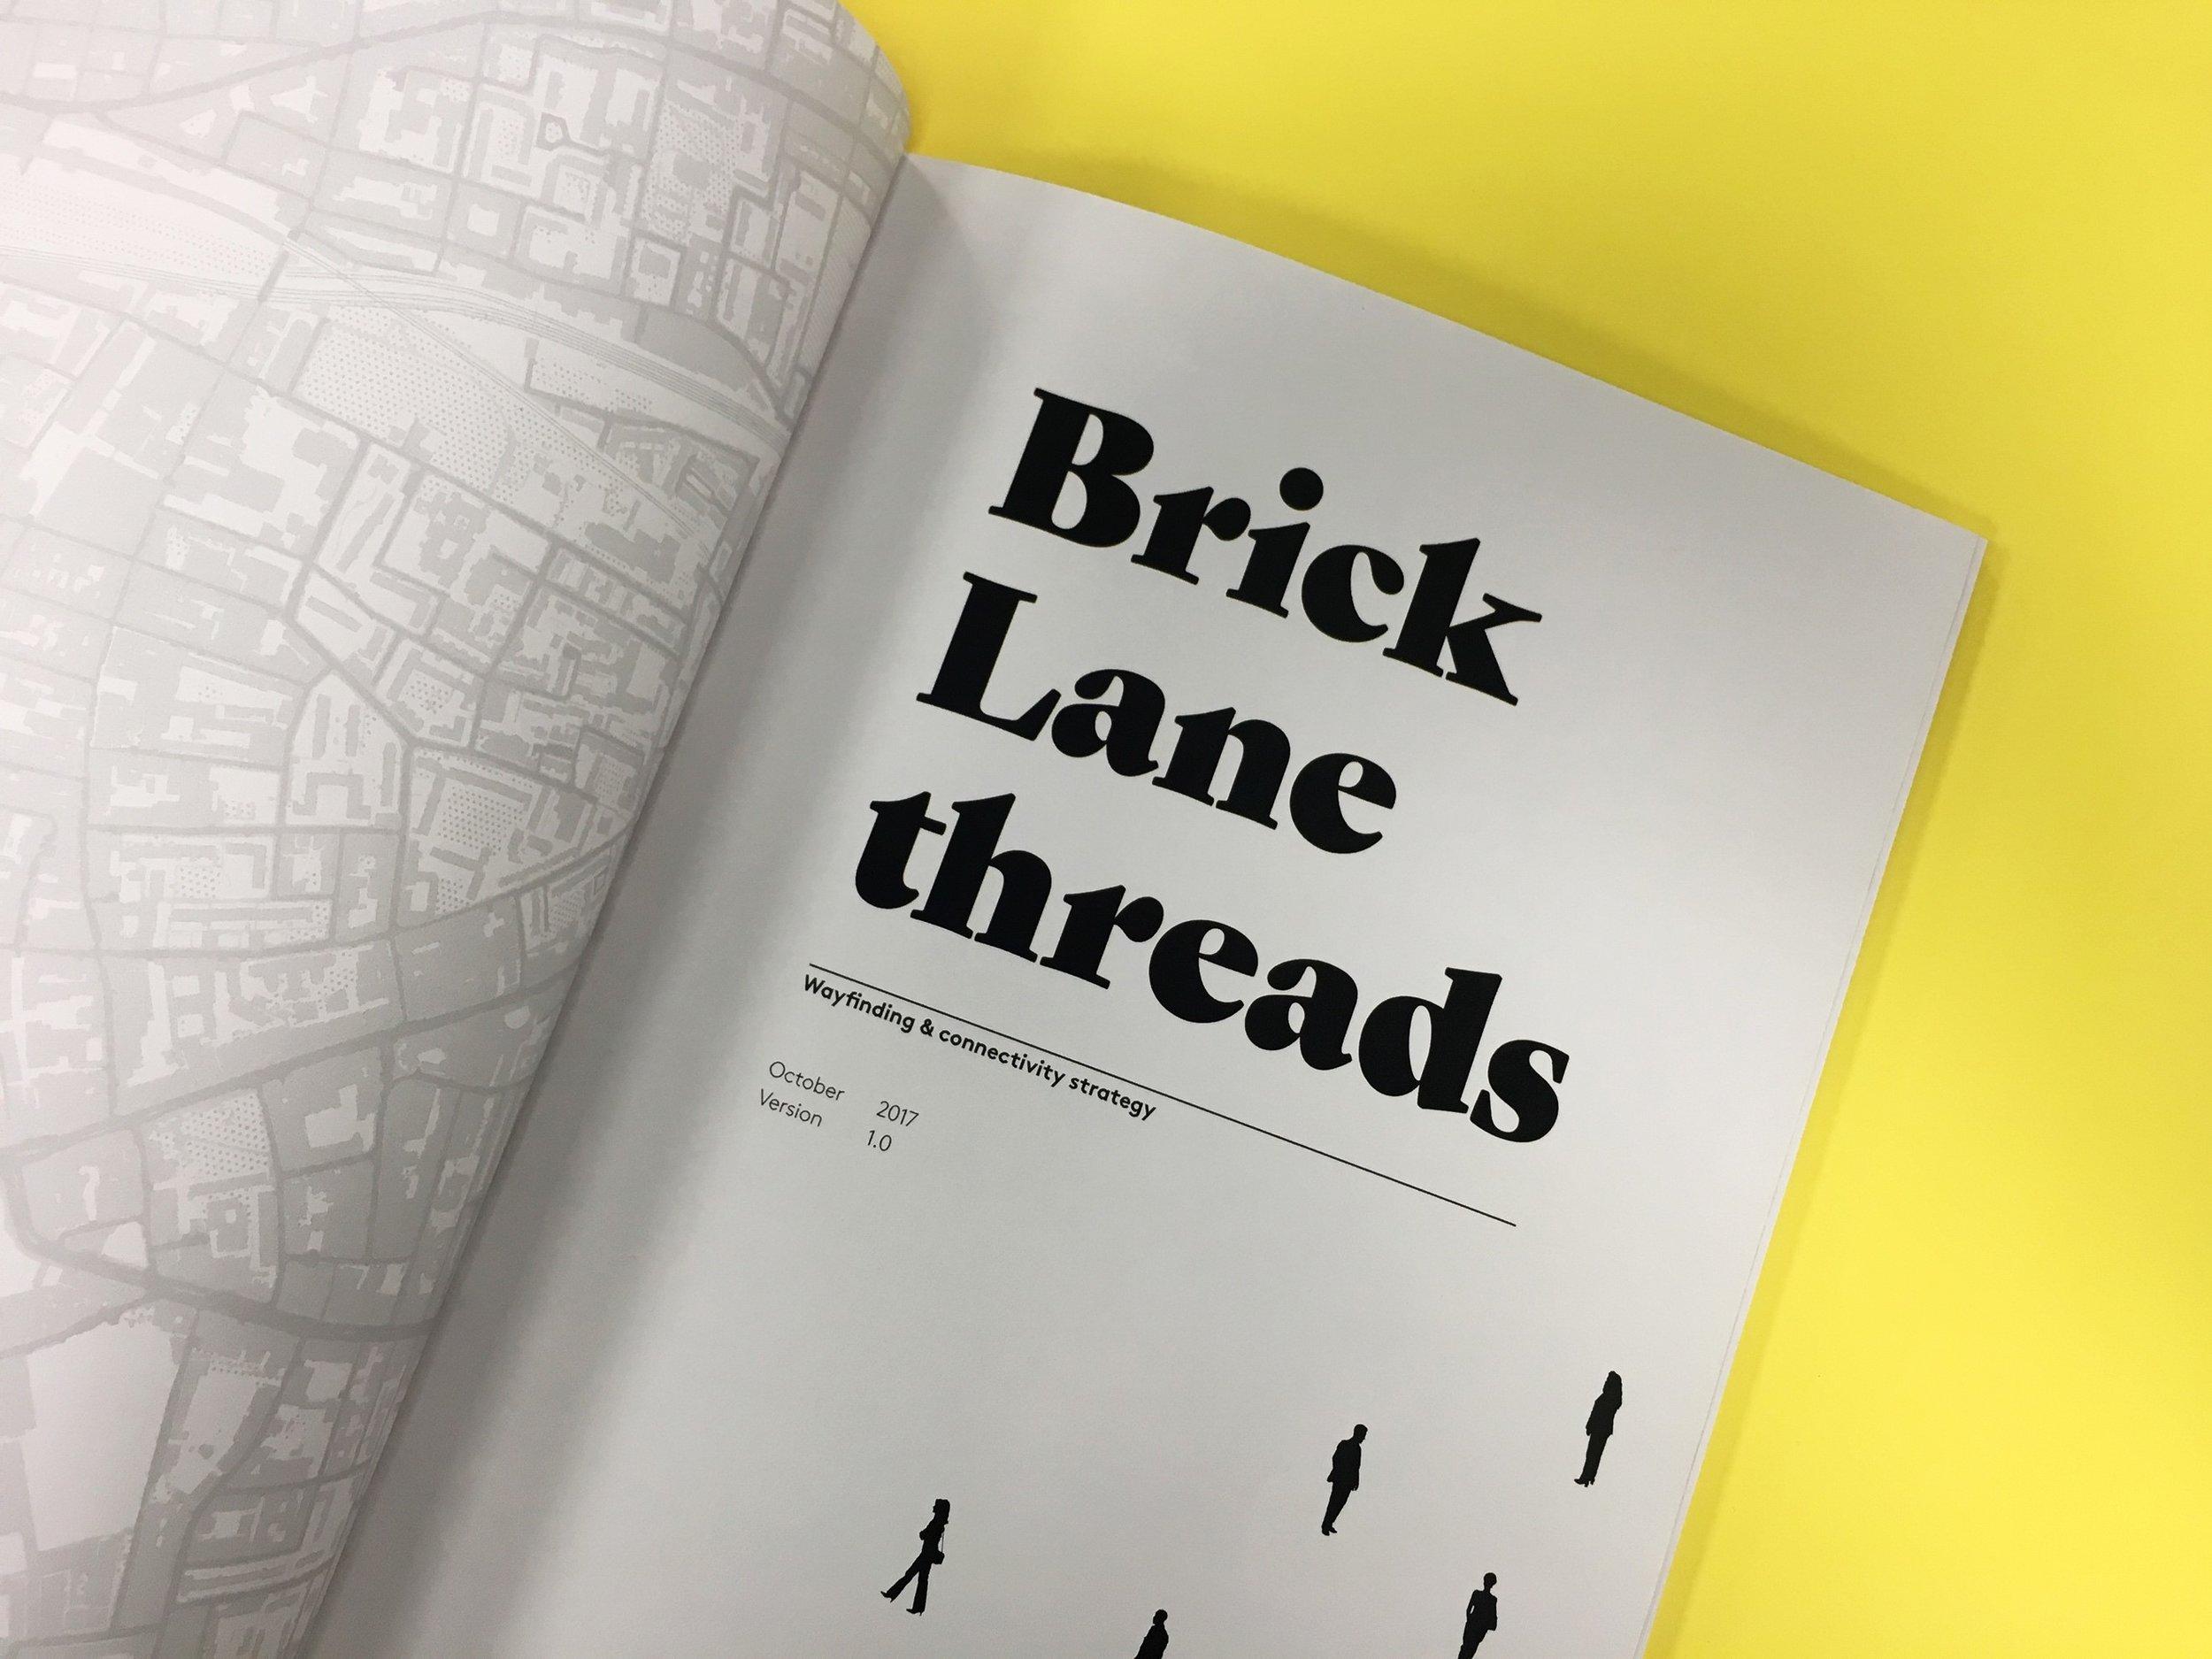 The Brick Lane project is an award winner for Bridget's team.